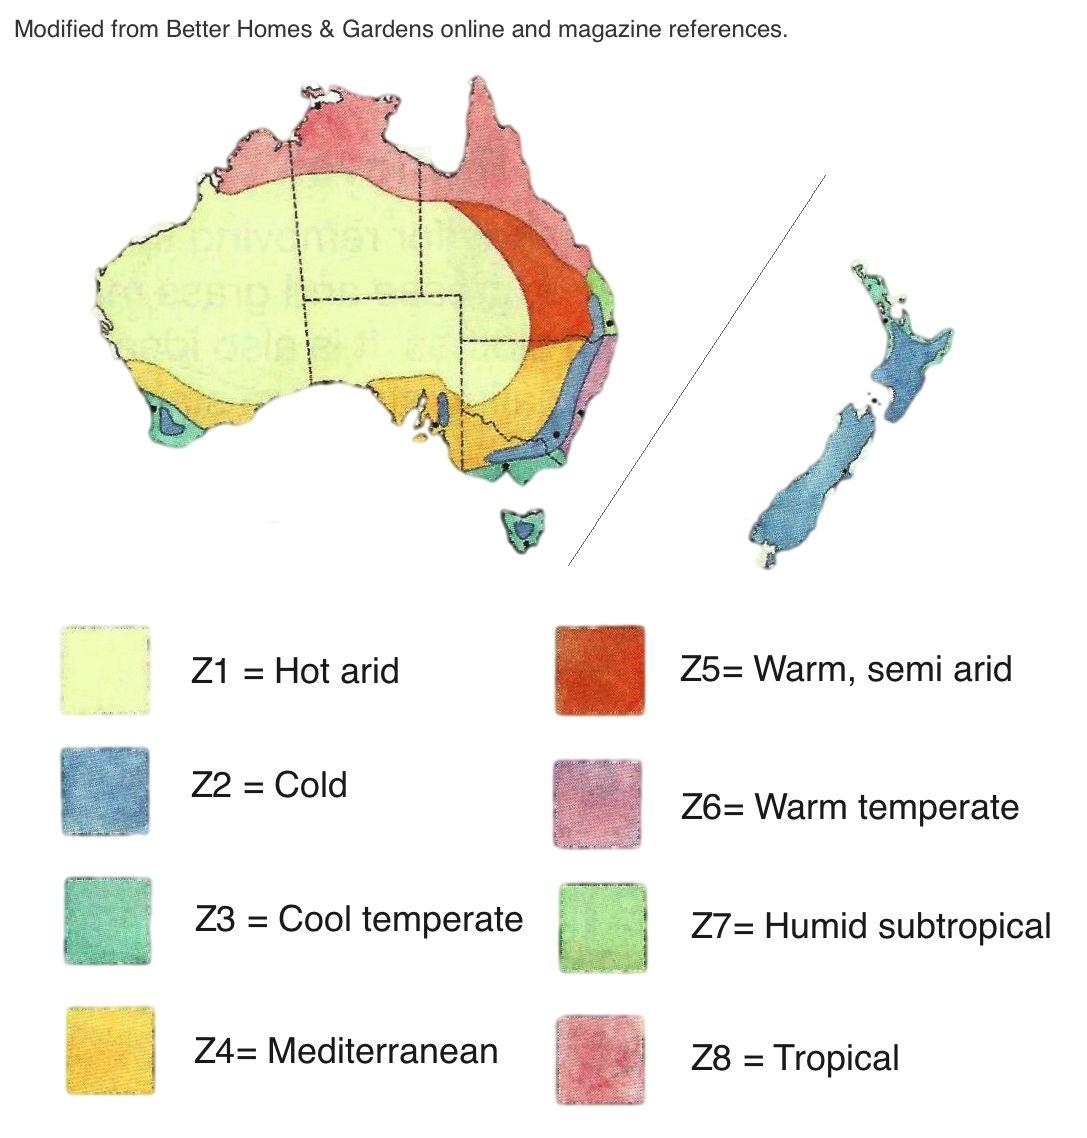 australian gardening climate zones - Google Search